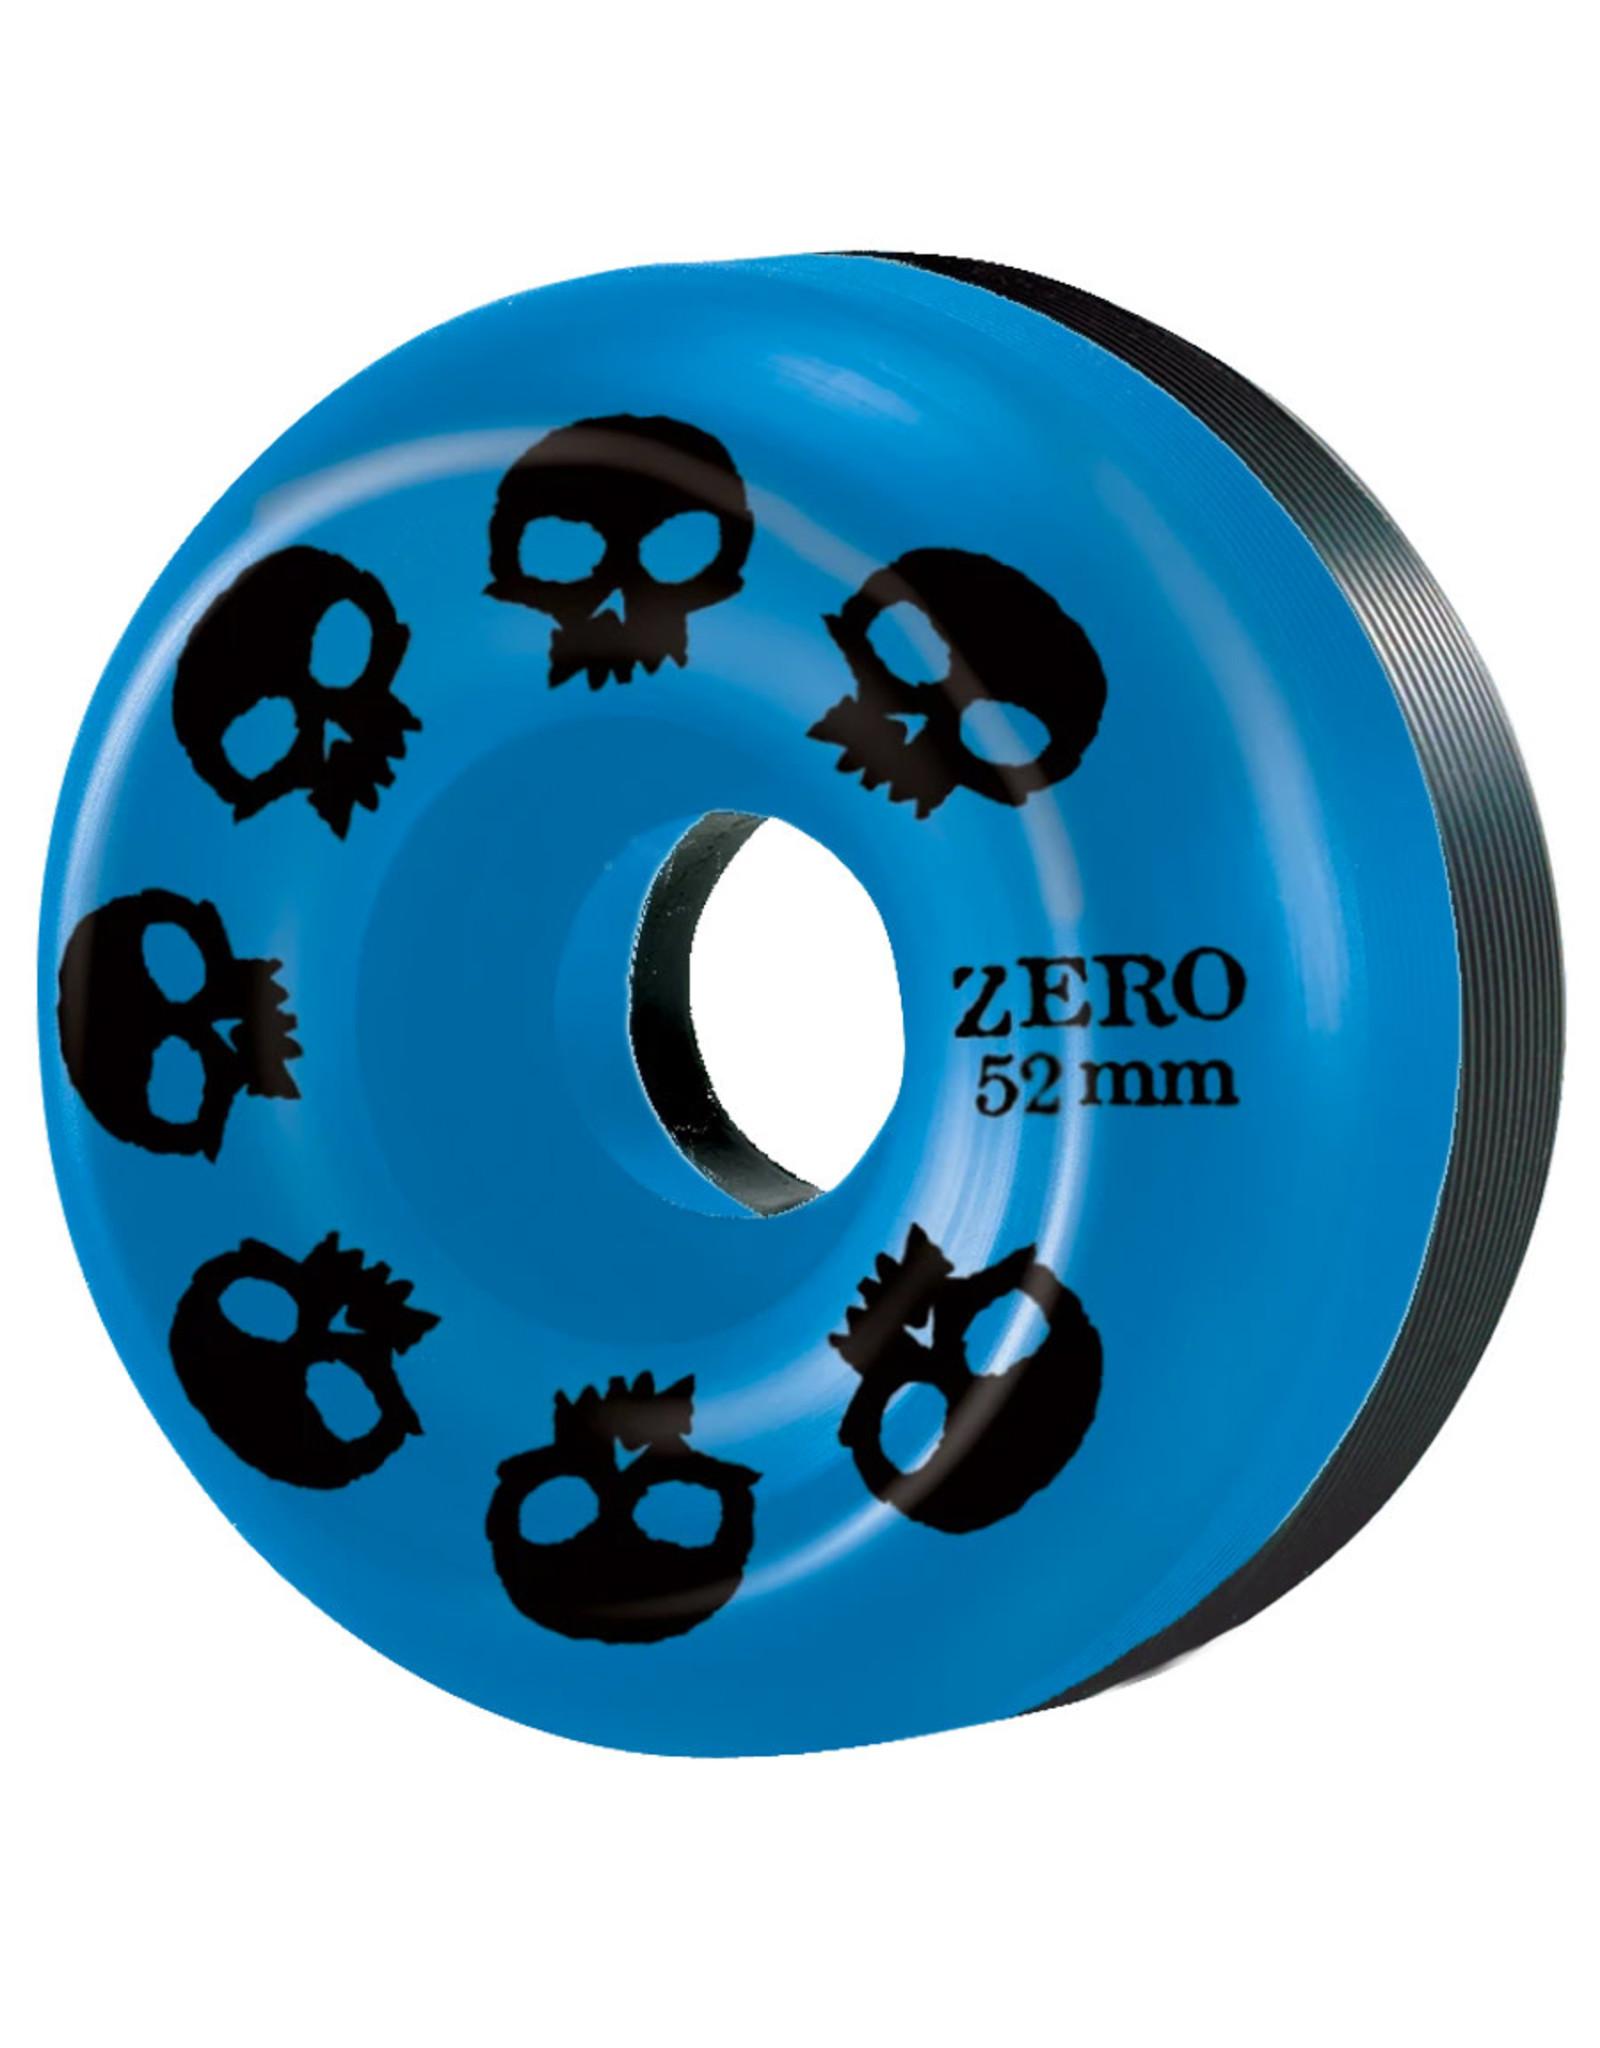 Zero Skateboards Zero Wheels Multi Skull Blue/Black Split (52mm/99a)